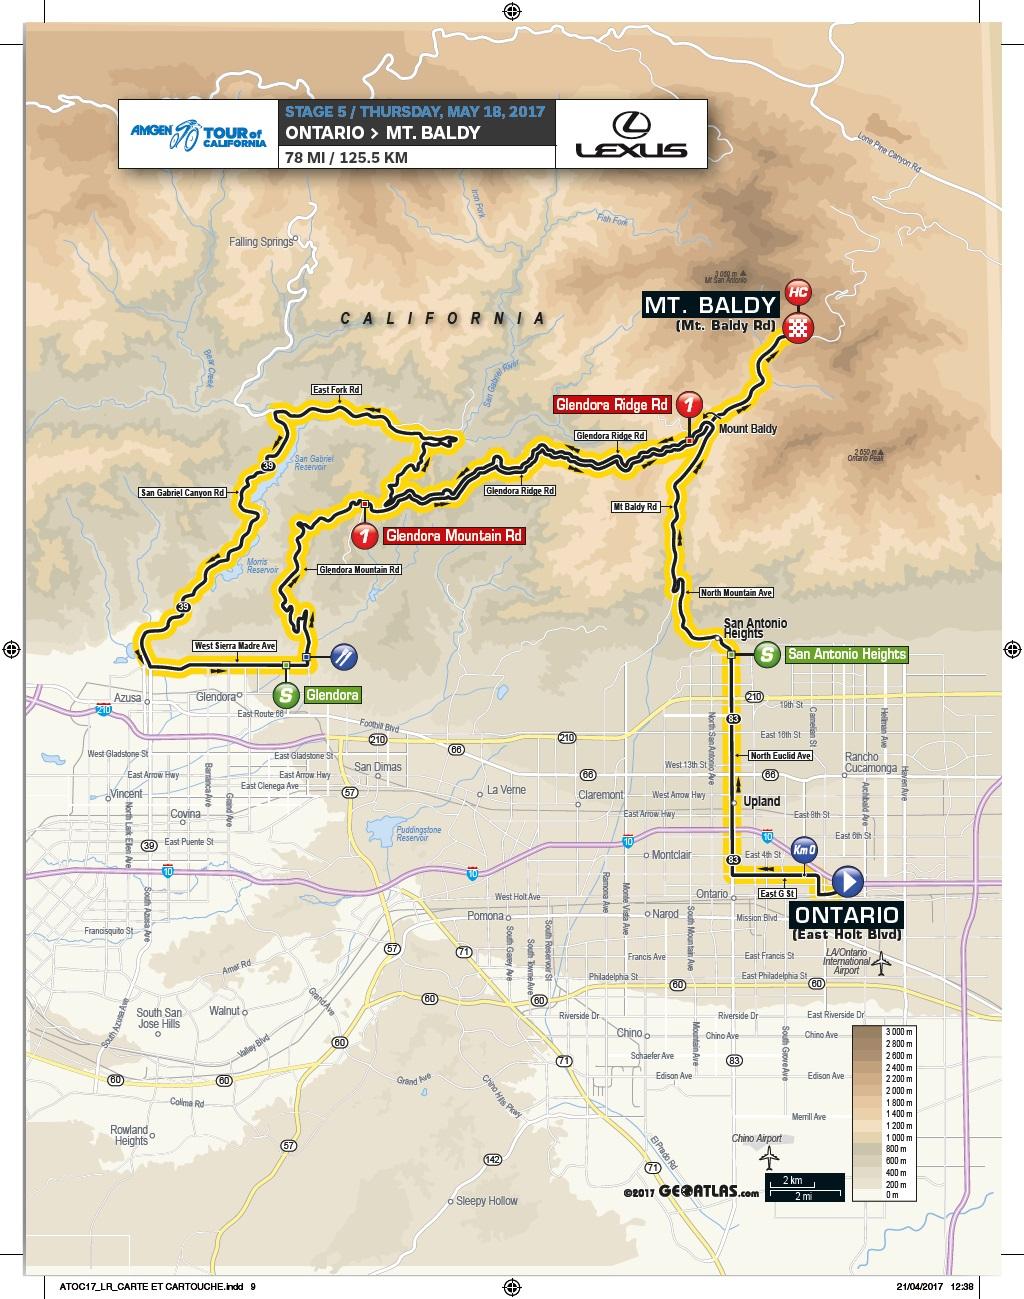 Streckenverlauf Amgen Tour of California 2017 - Etappe 5